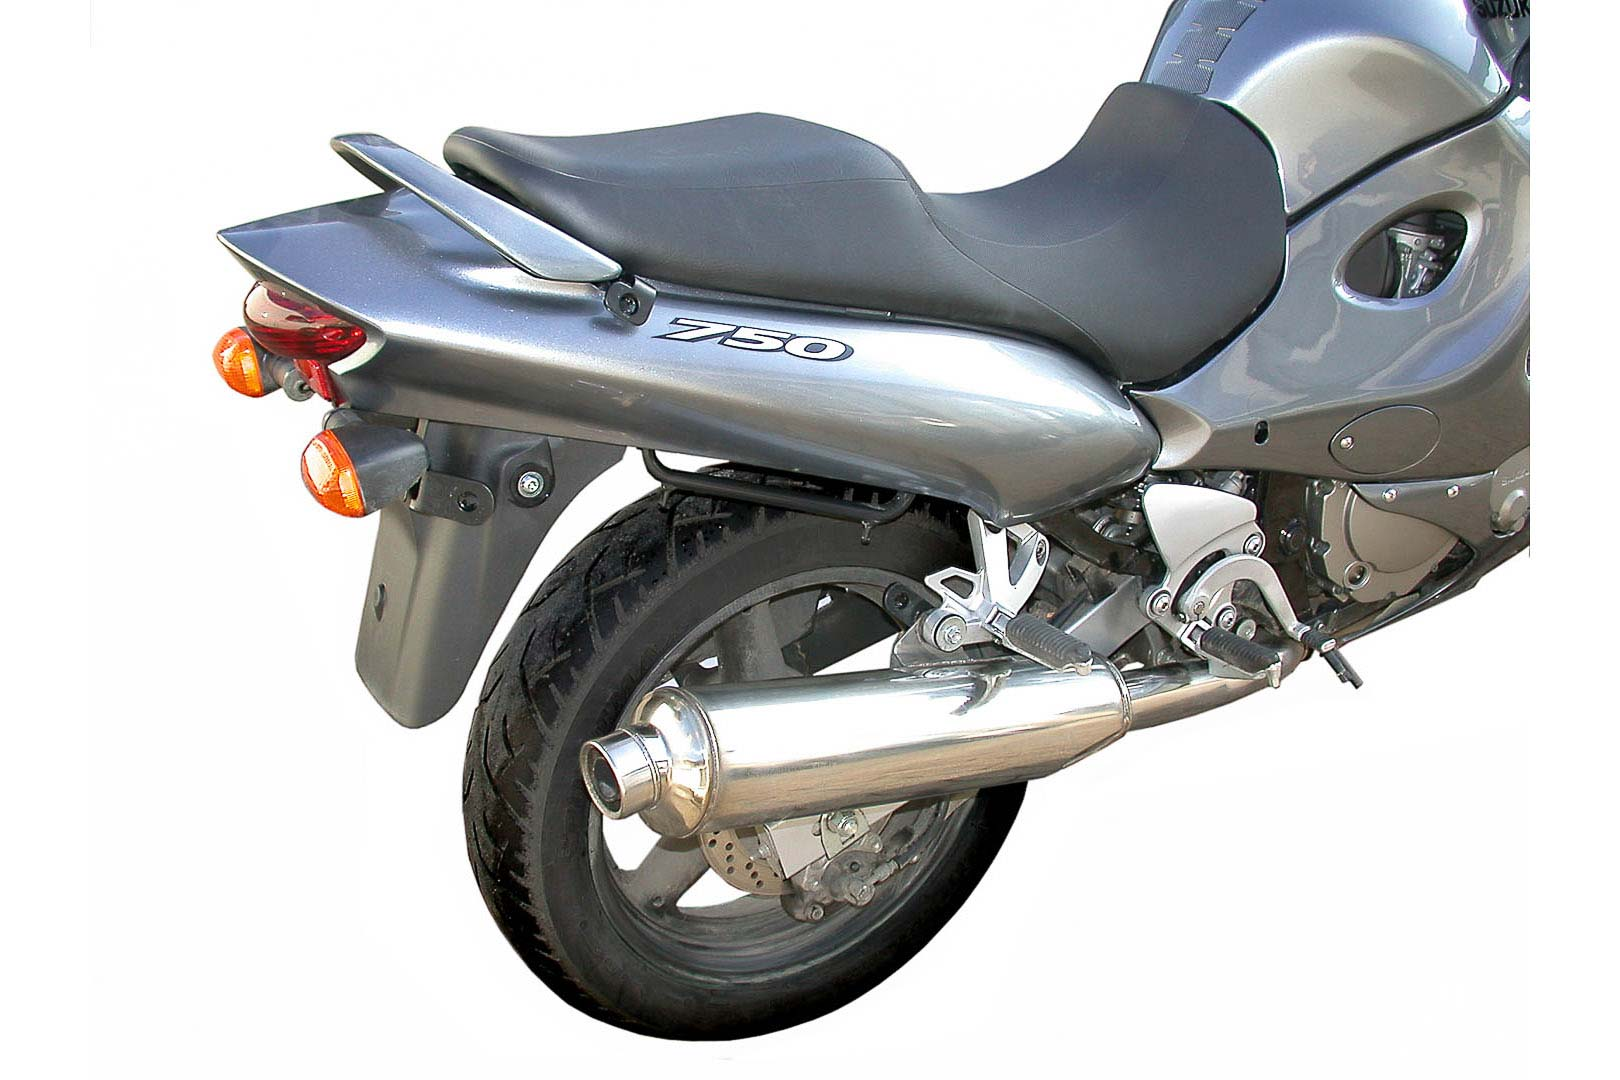 SW-Motech Quick-Lock Evo sivutelinesarja Suzuki GSX750F 03-06